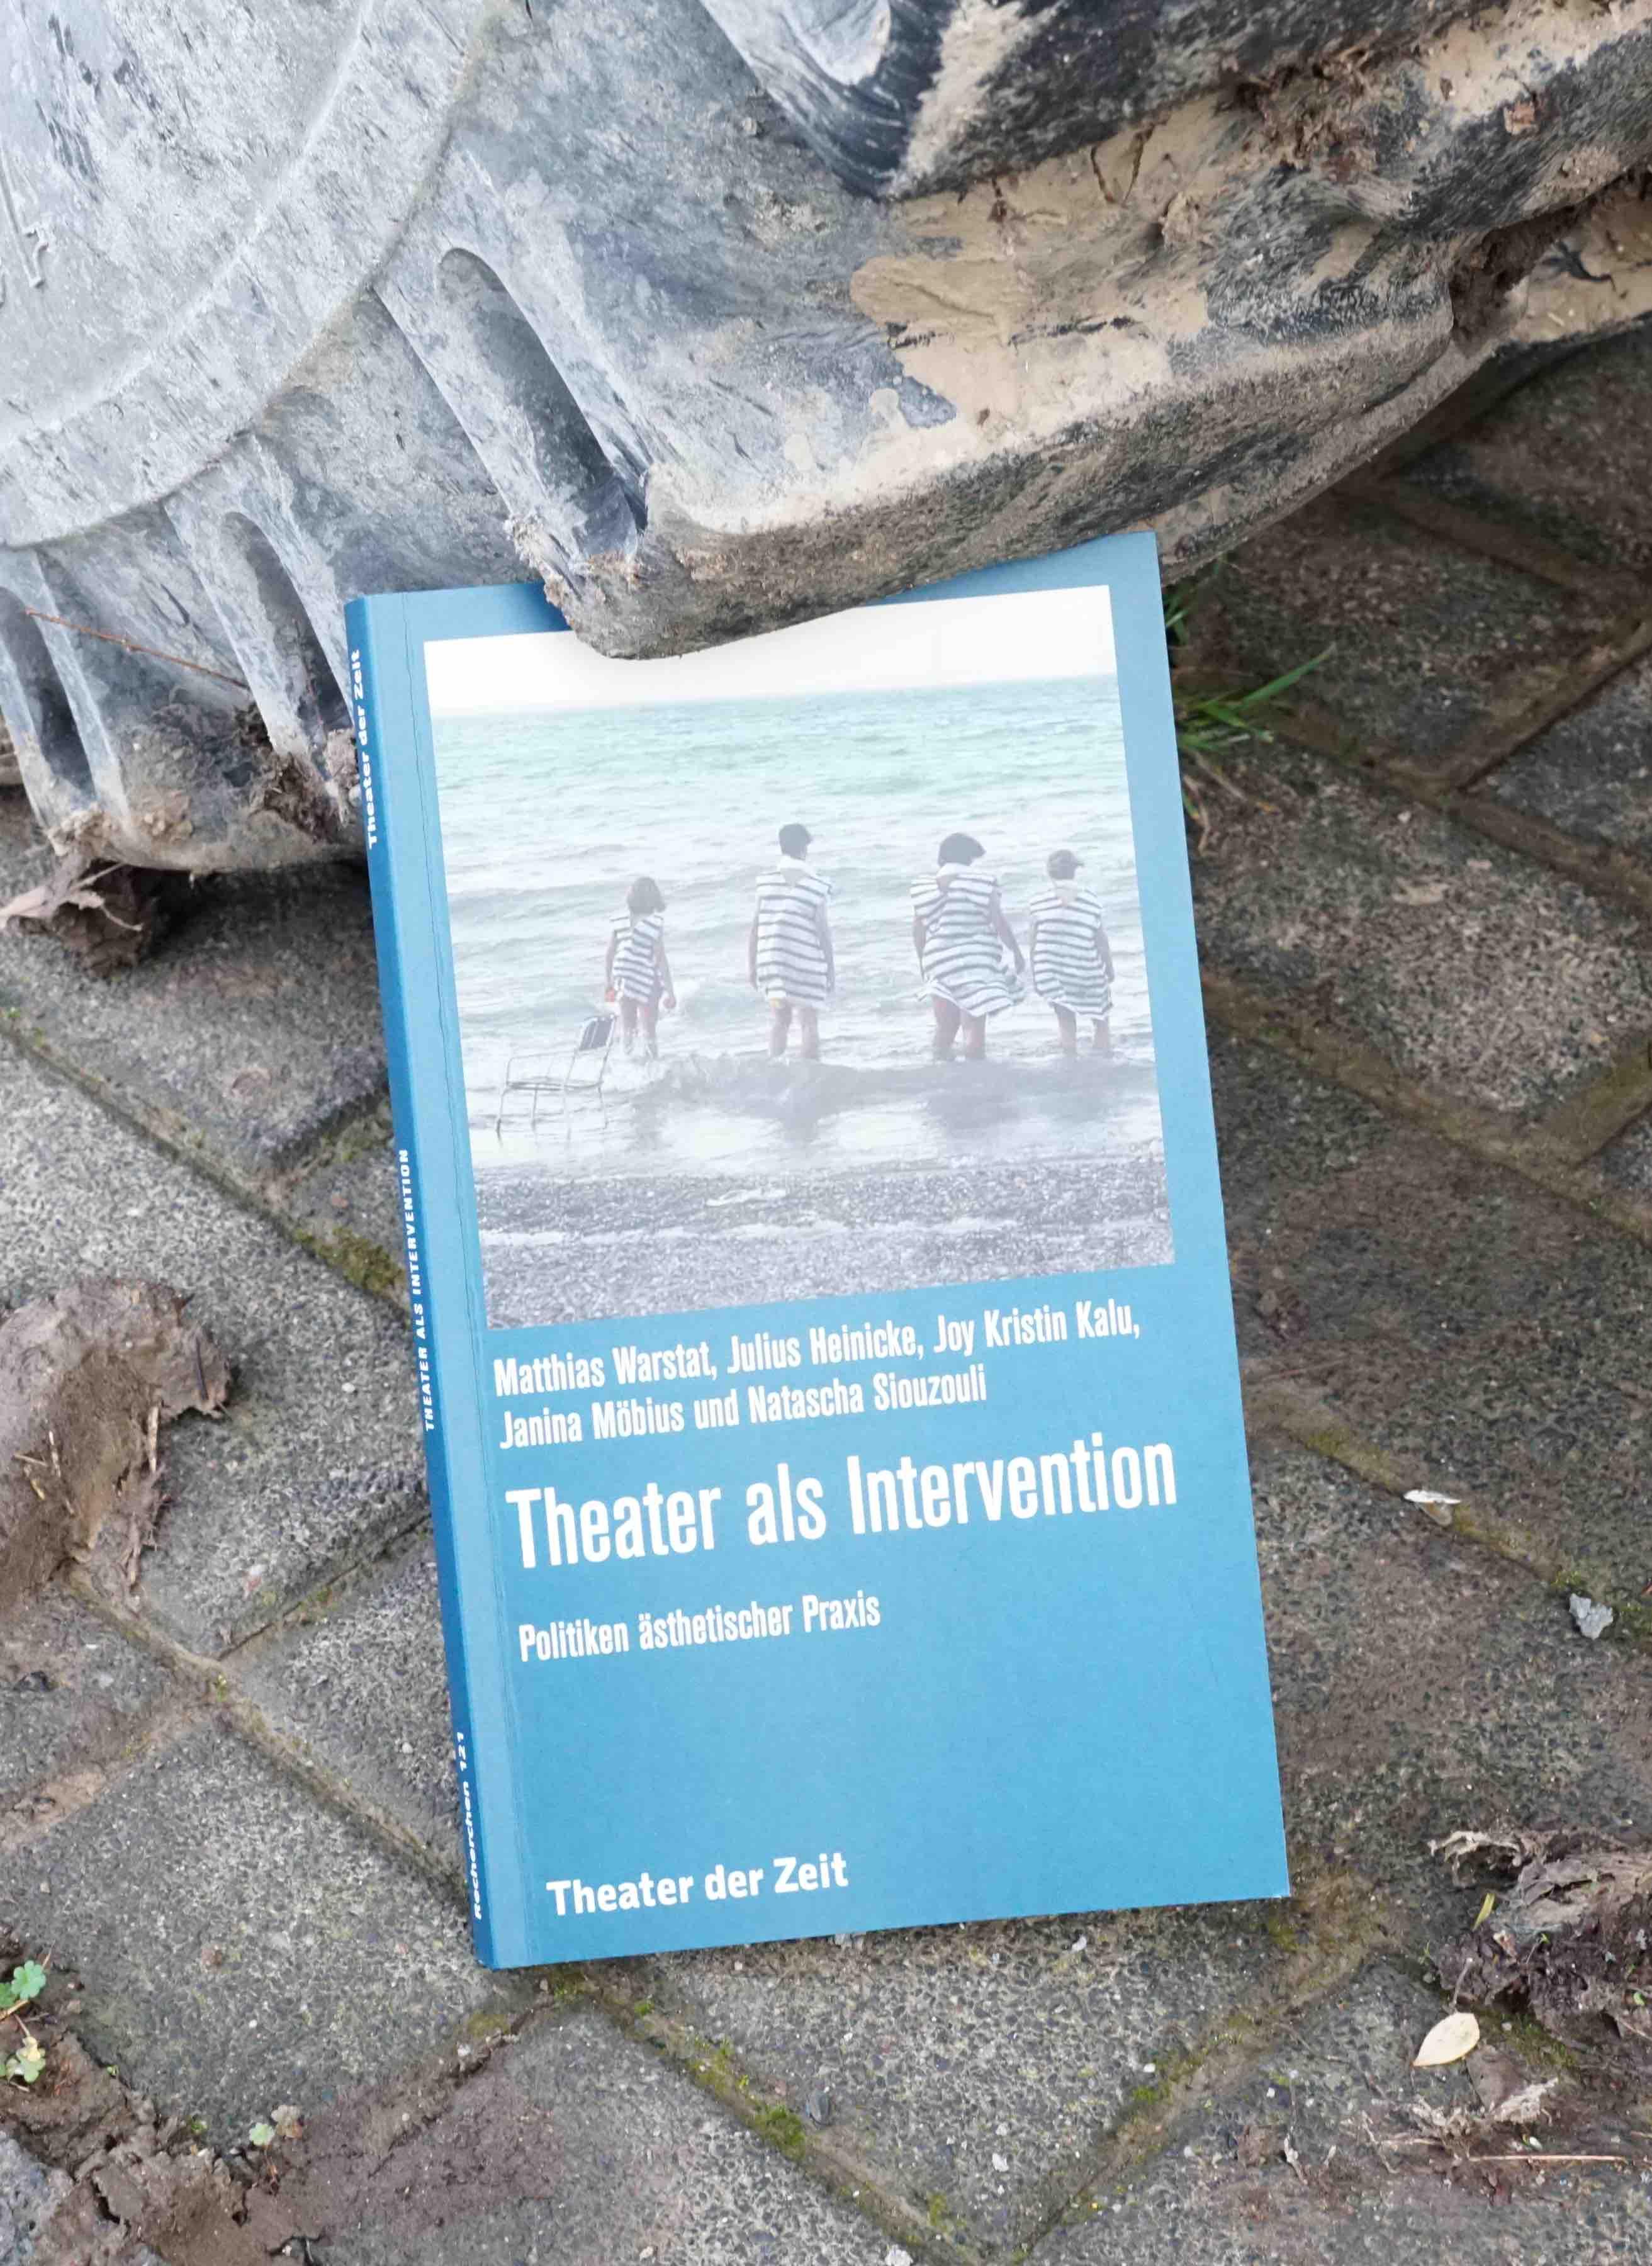 Warstat u.a. (Hg)(2015): Theater als Intervention – Rezension